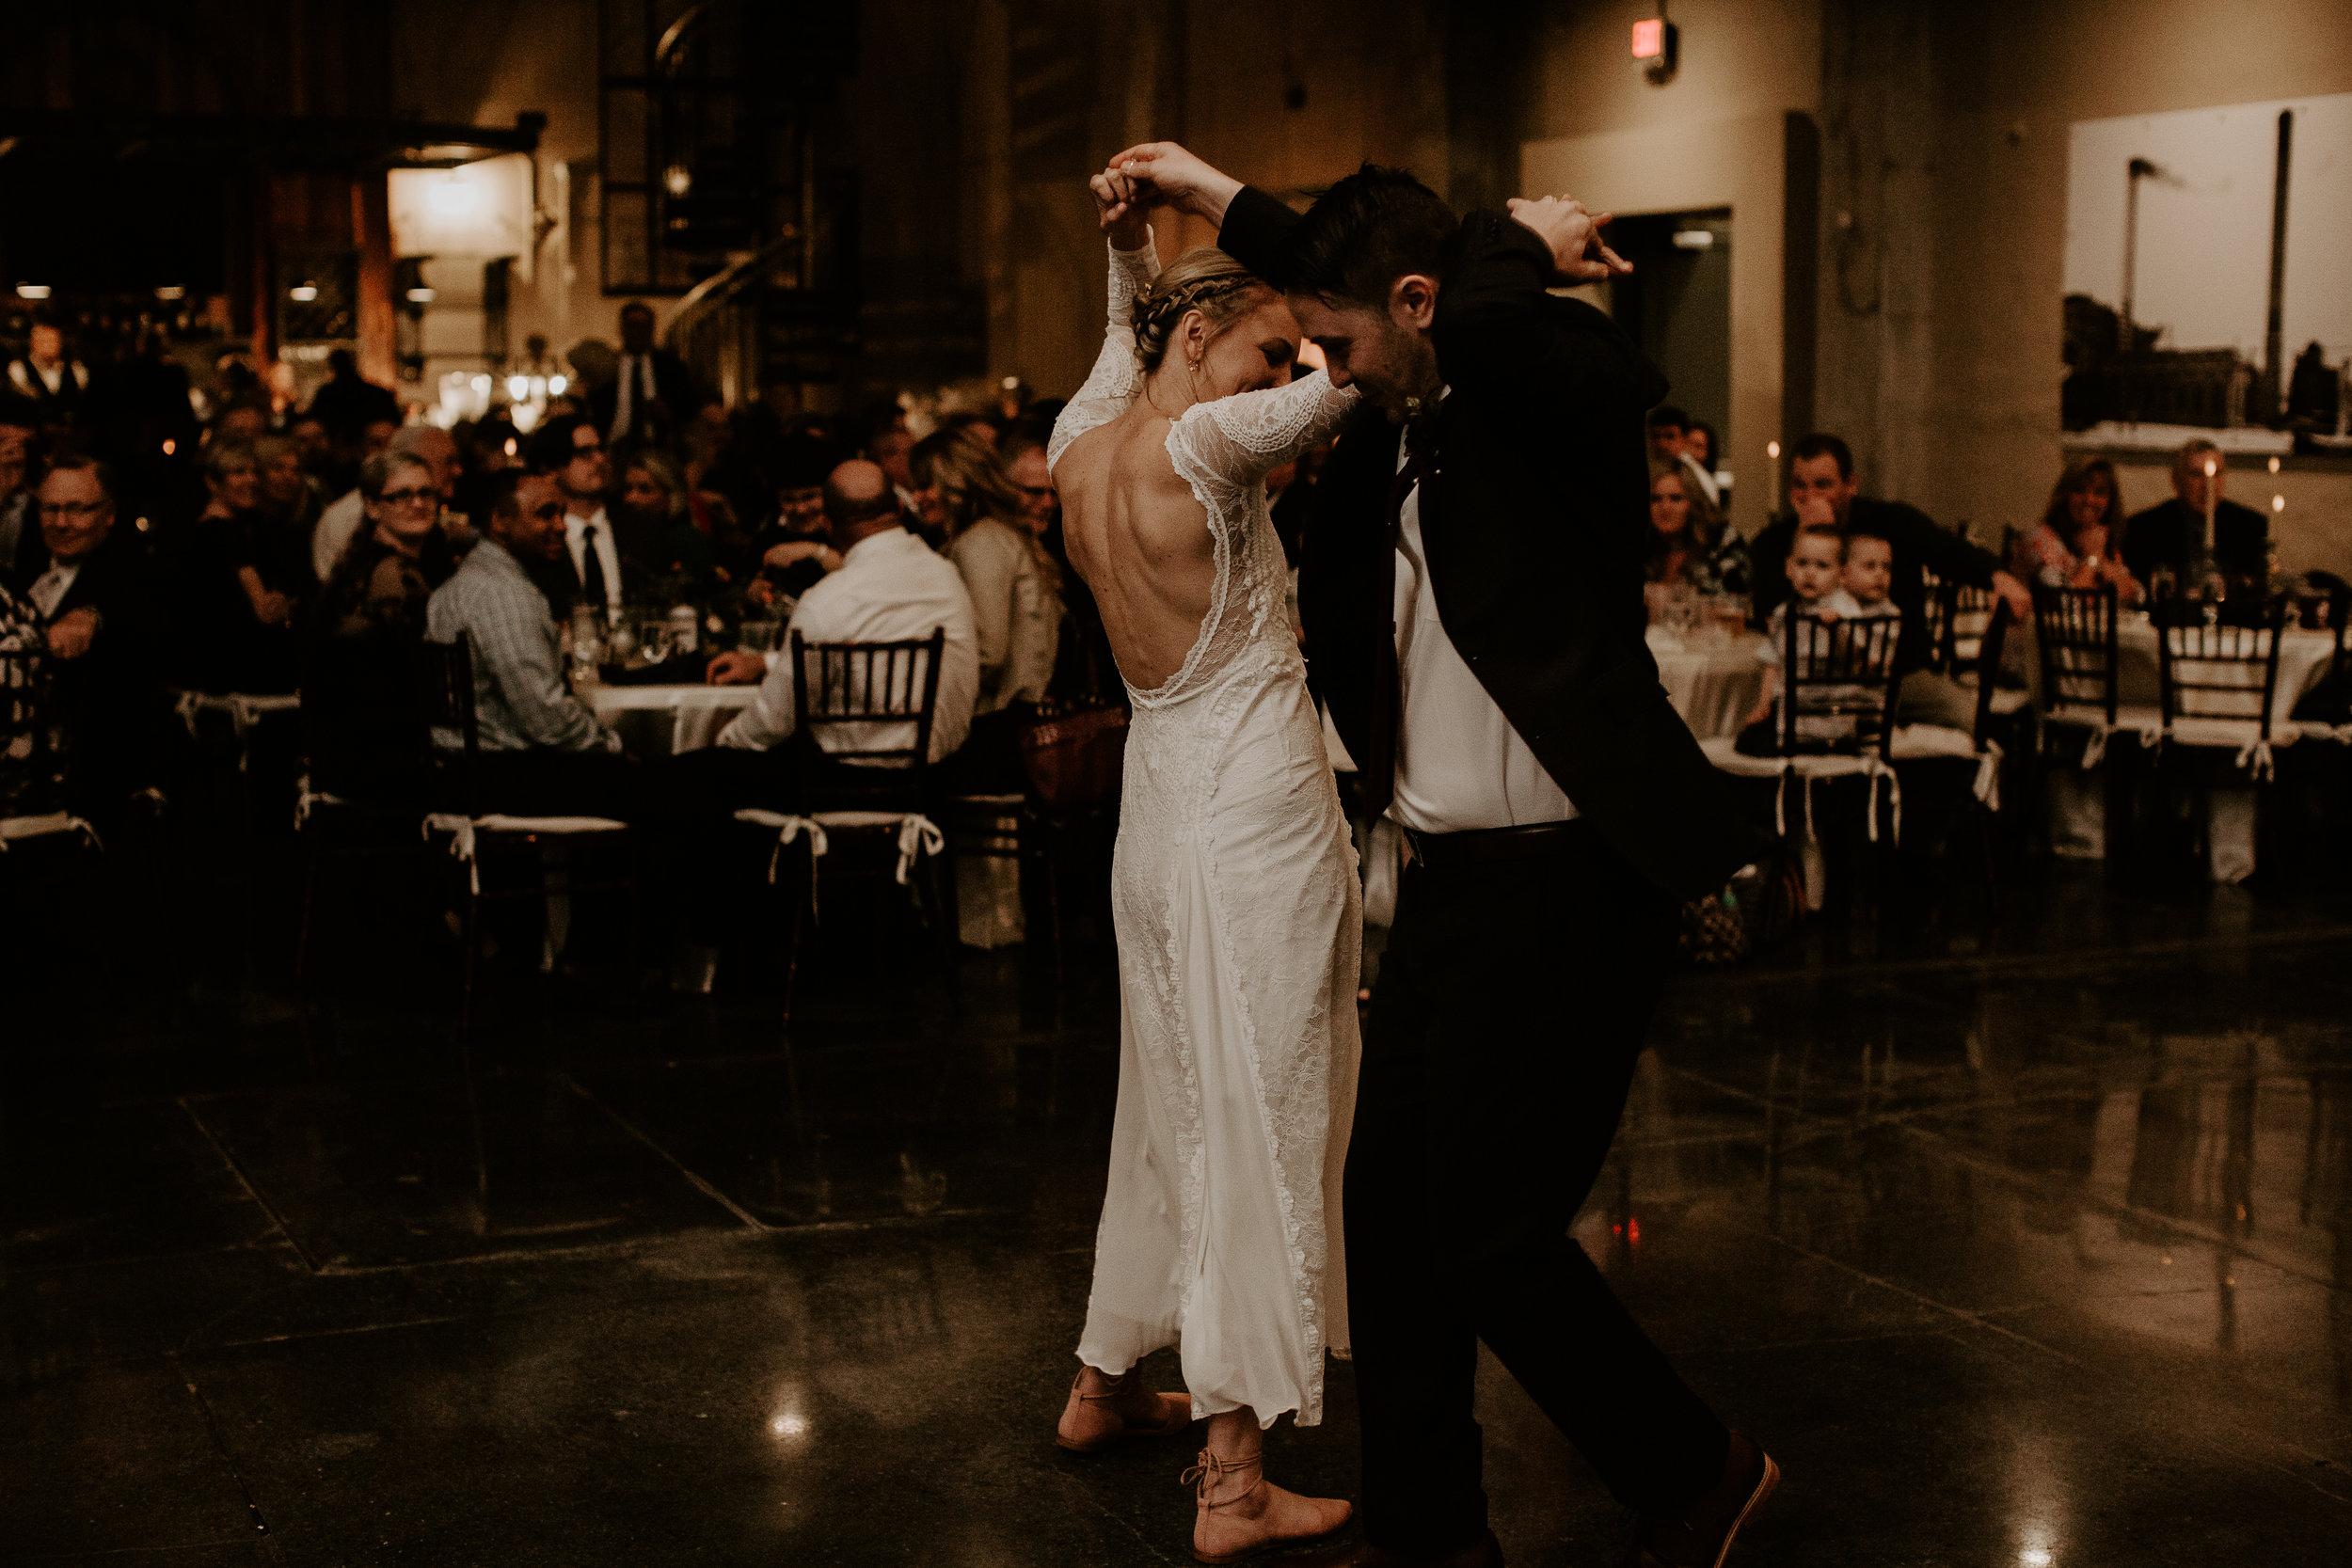 The_Steam_Plant_Dayton_Wedding-EDIT-563.jpg